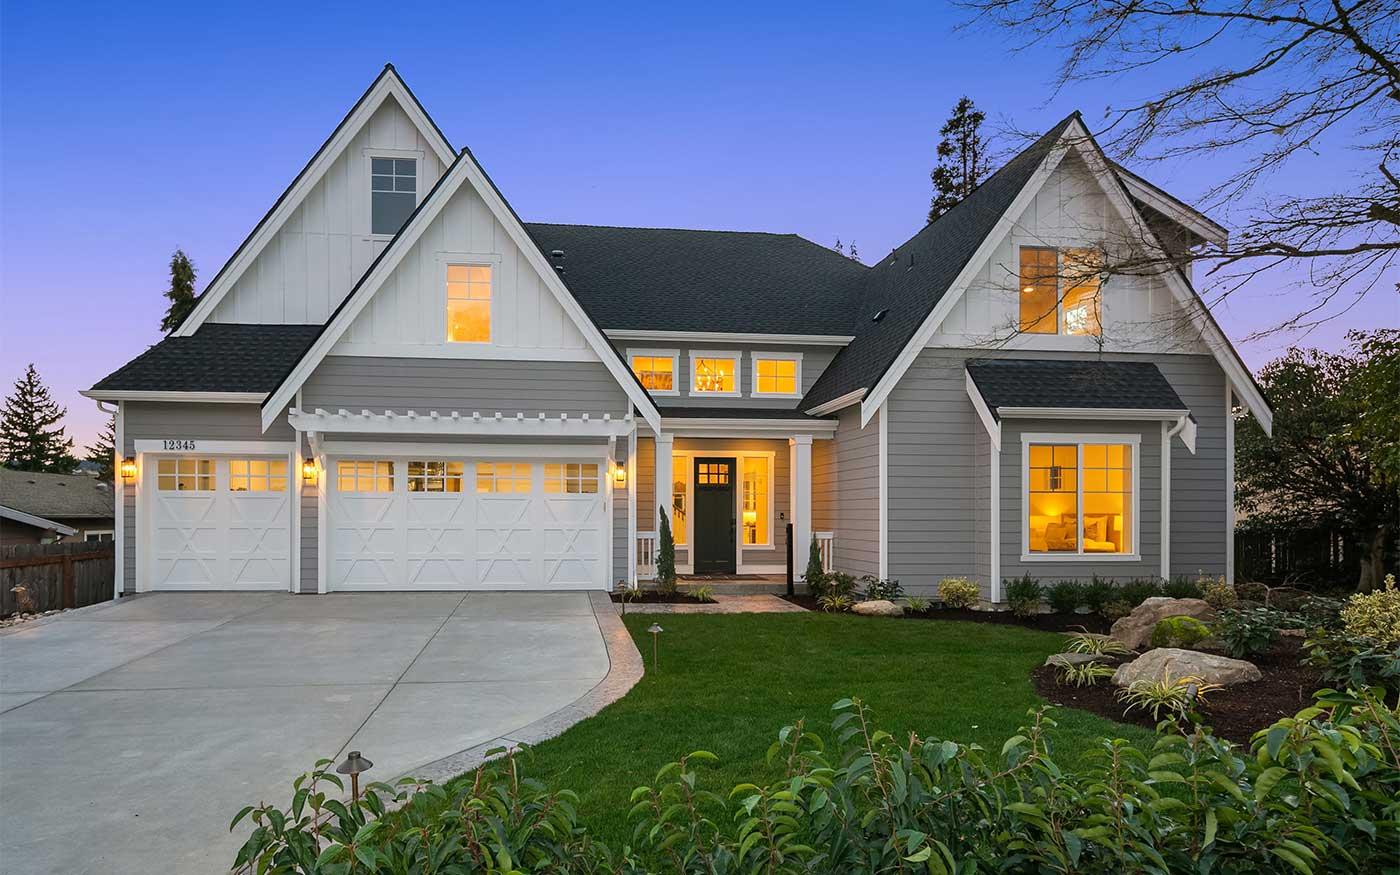 MN Custom Homes Different by Design Slideshow 1